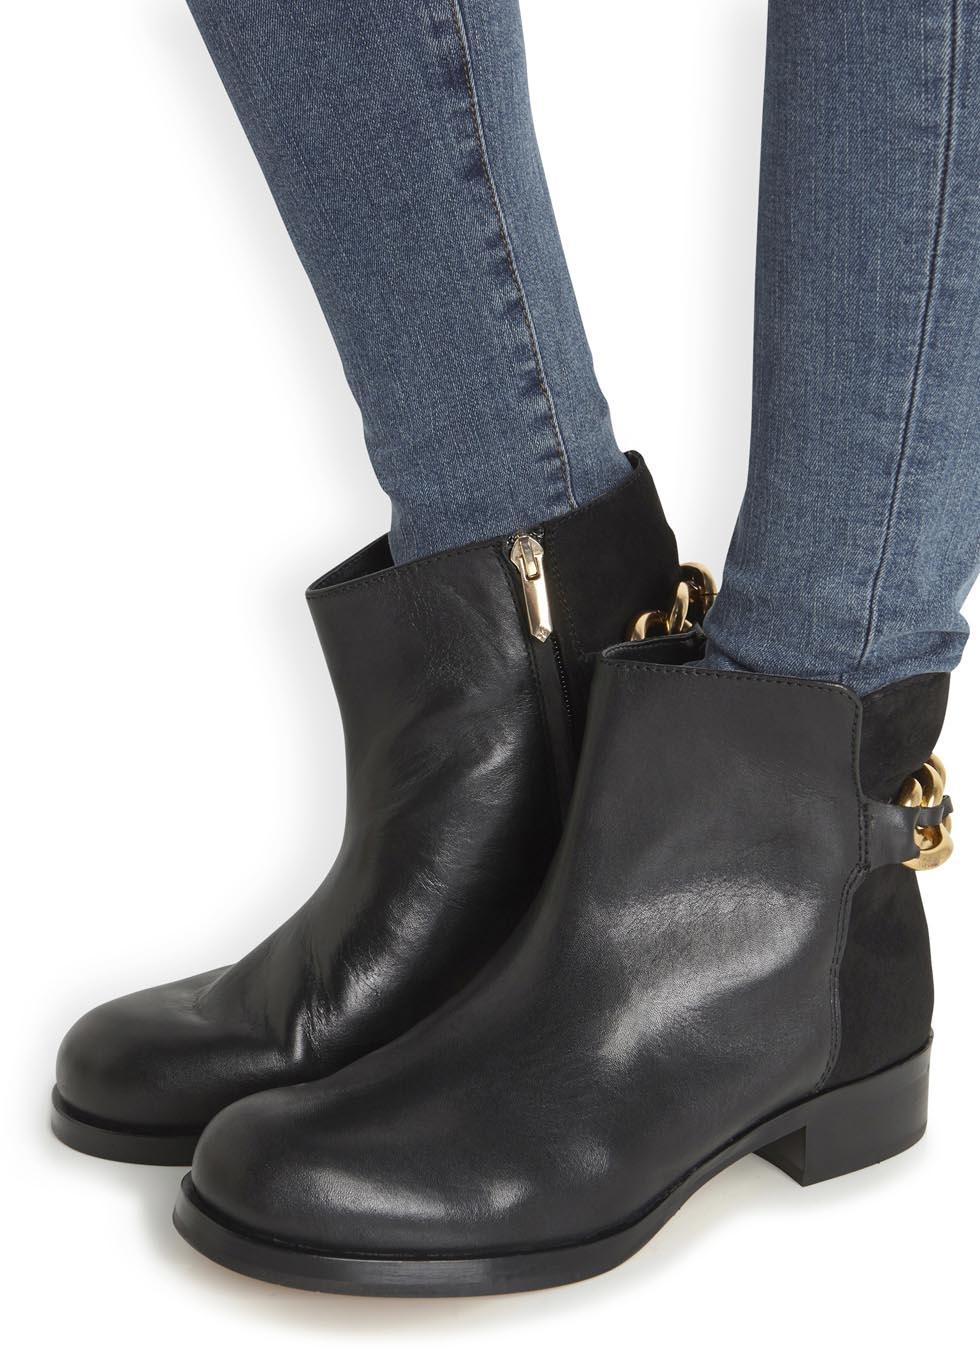 644e7322d92af5 Sam Edelman Chester Black Leather Ankle Boots in Black - Lyst